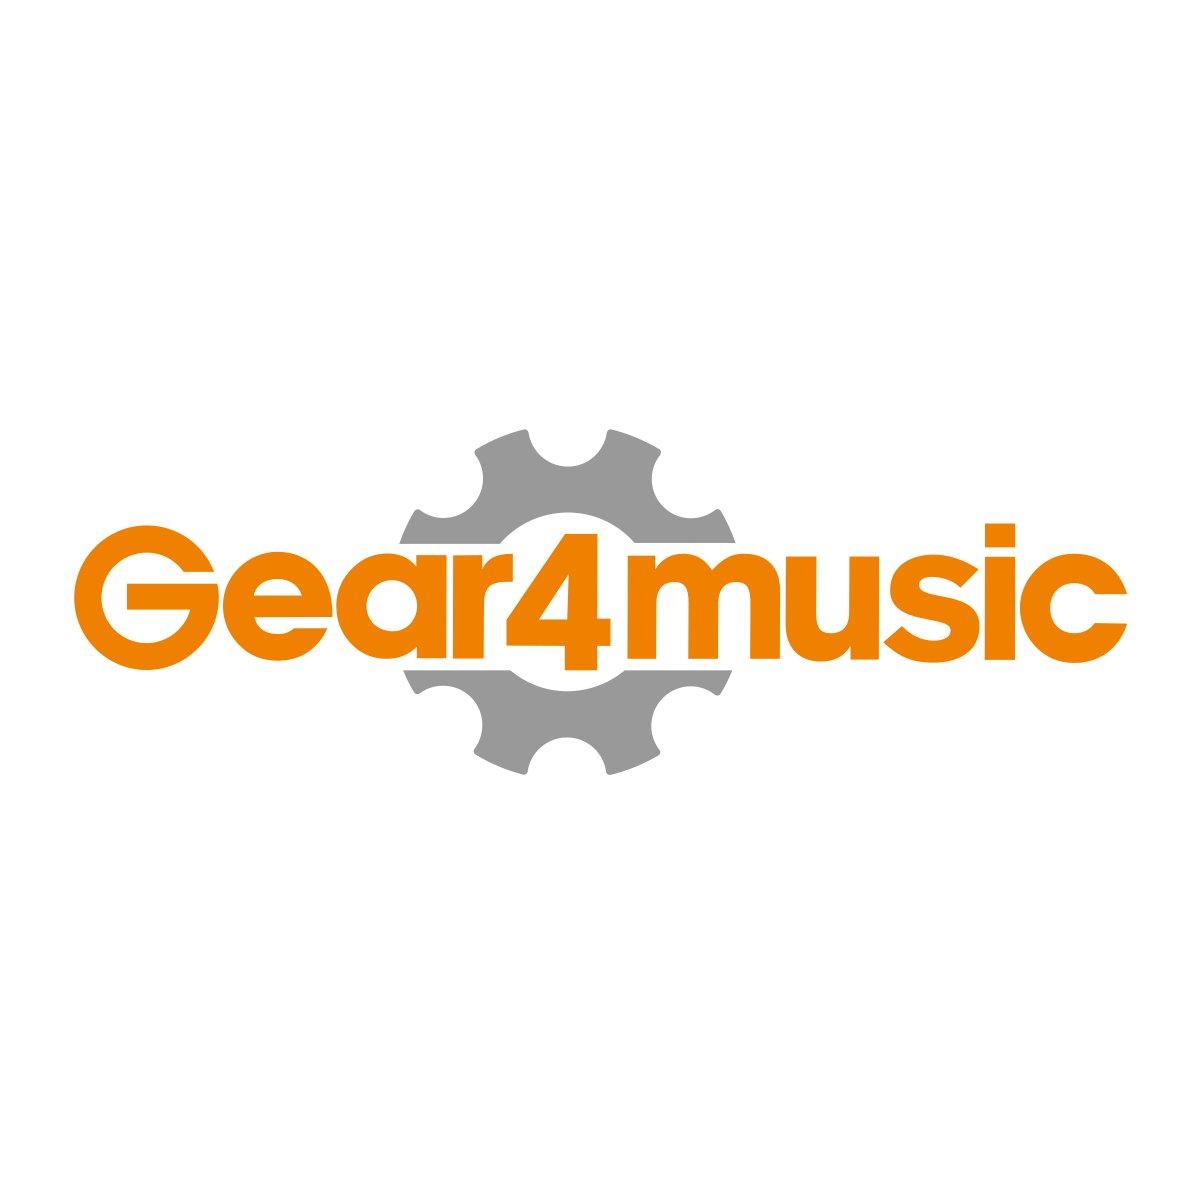 vox amplug 2 guitar headphone amp blues at gear4music. Black Bedroom Furniture Sets. Home Design Ideas